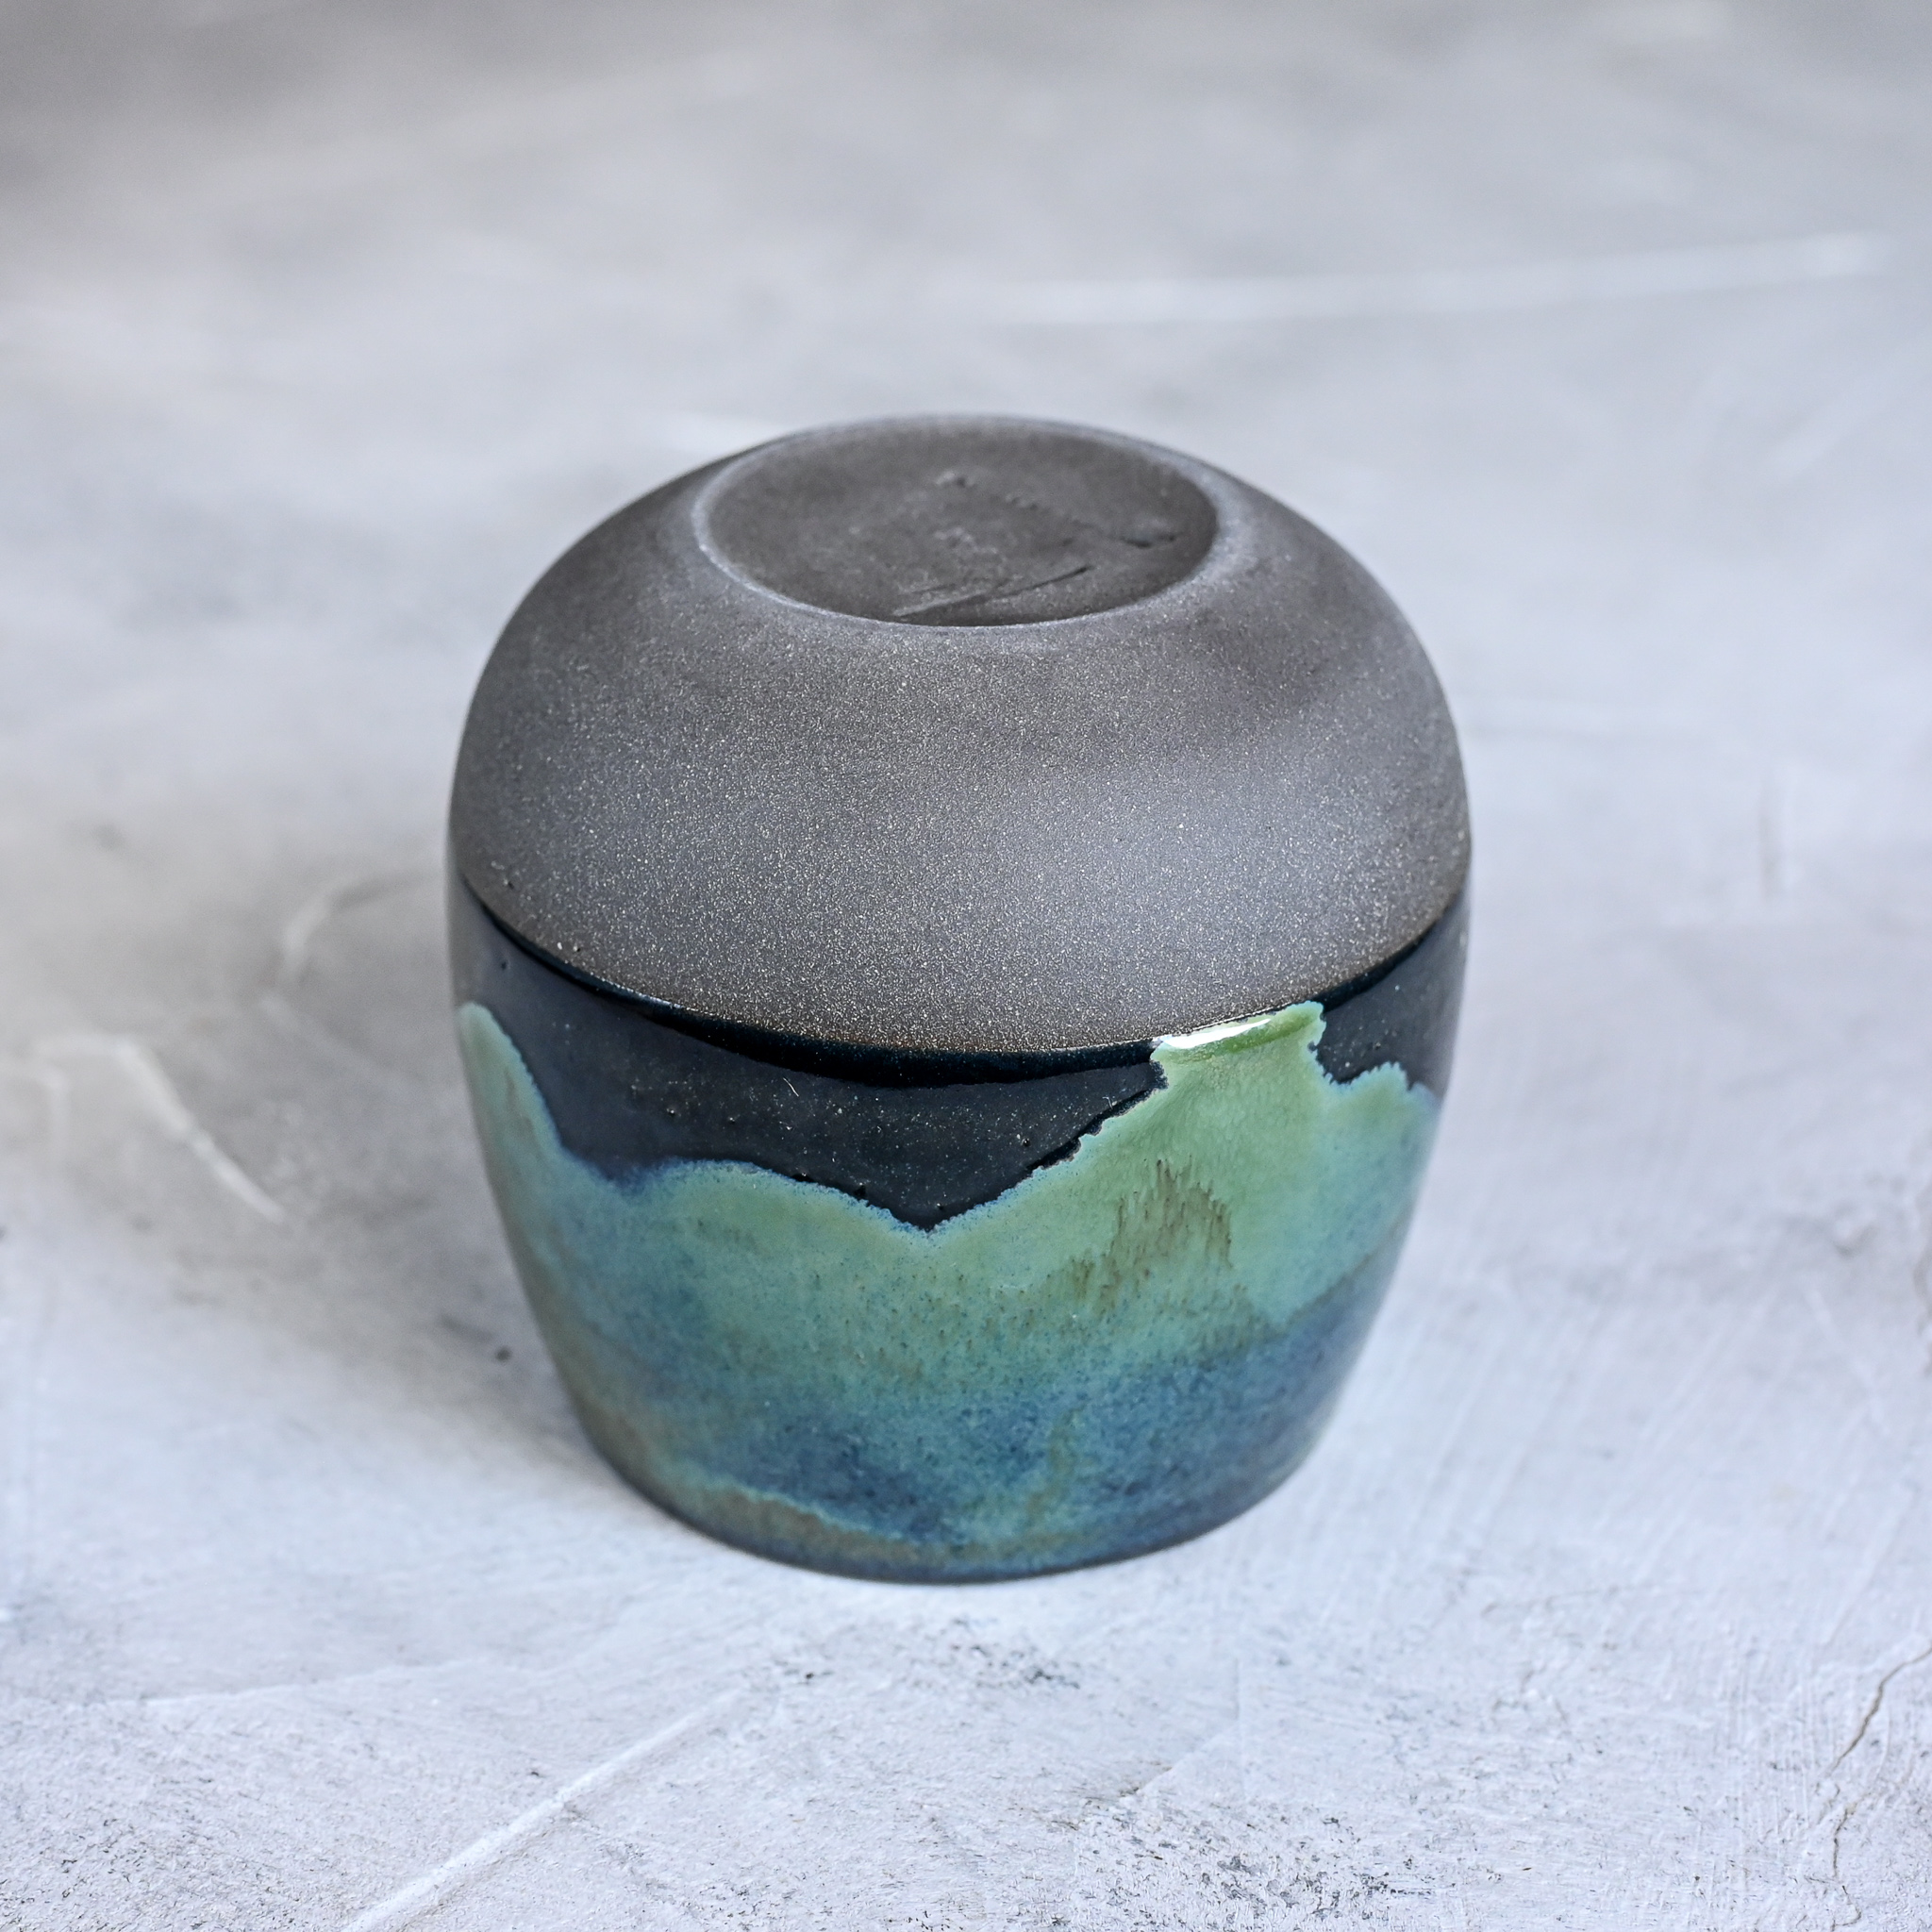 картинка Керамический стакан Марии Левиной 23 - DishWishes.Ru